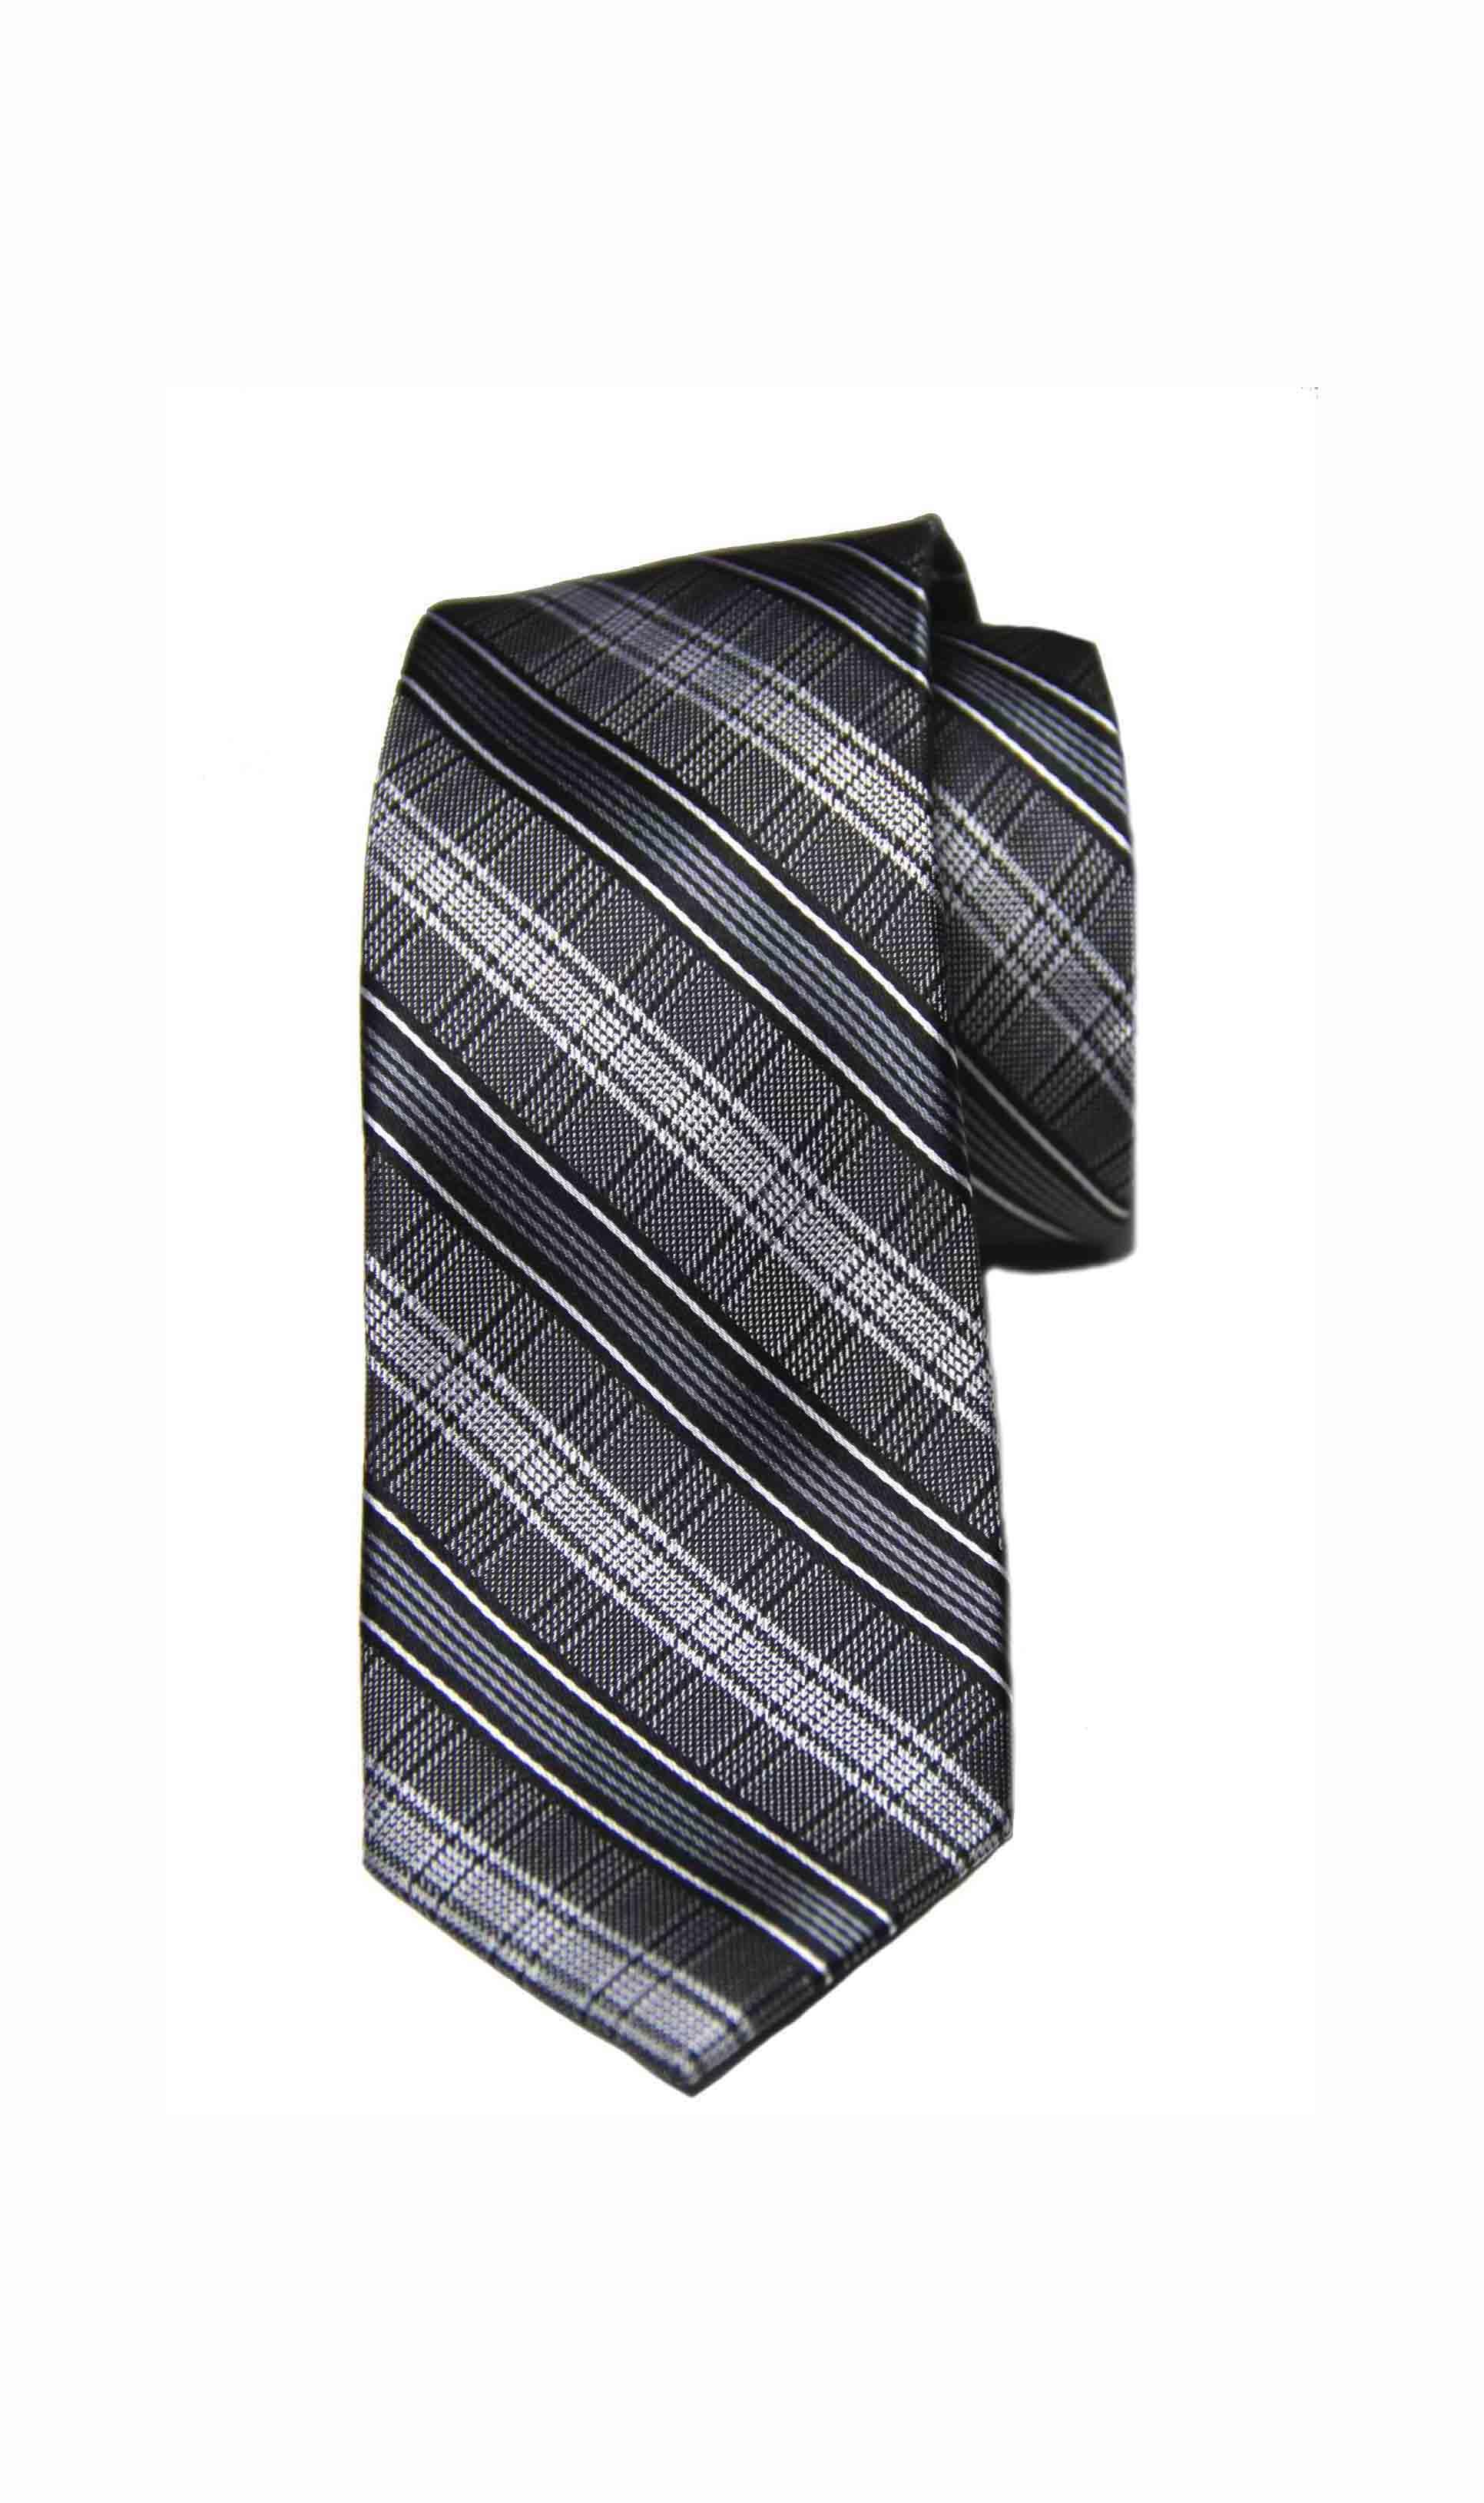 Ben Sherman Tie Gray Black Plaid Silk Narrow Men's